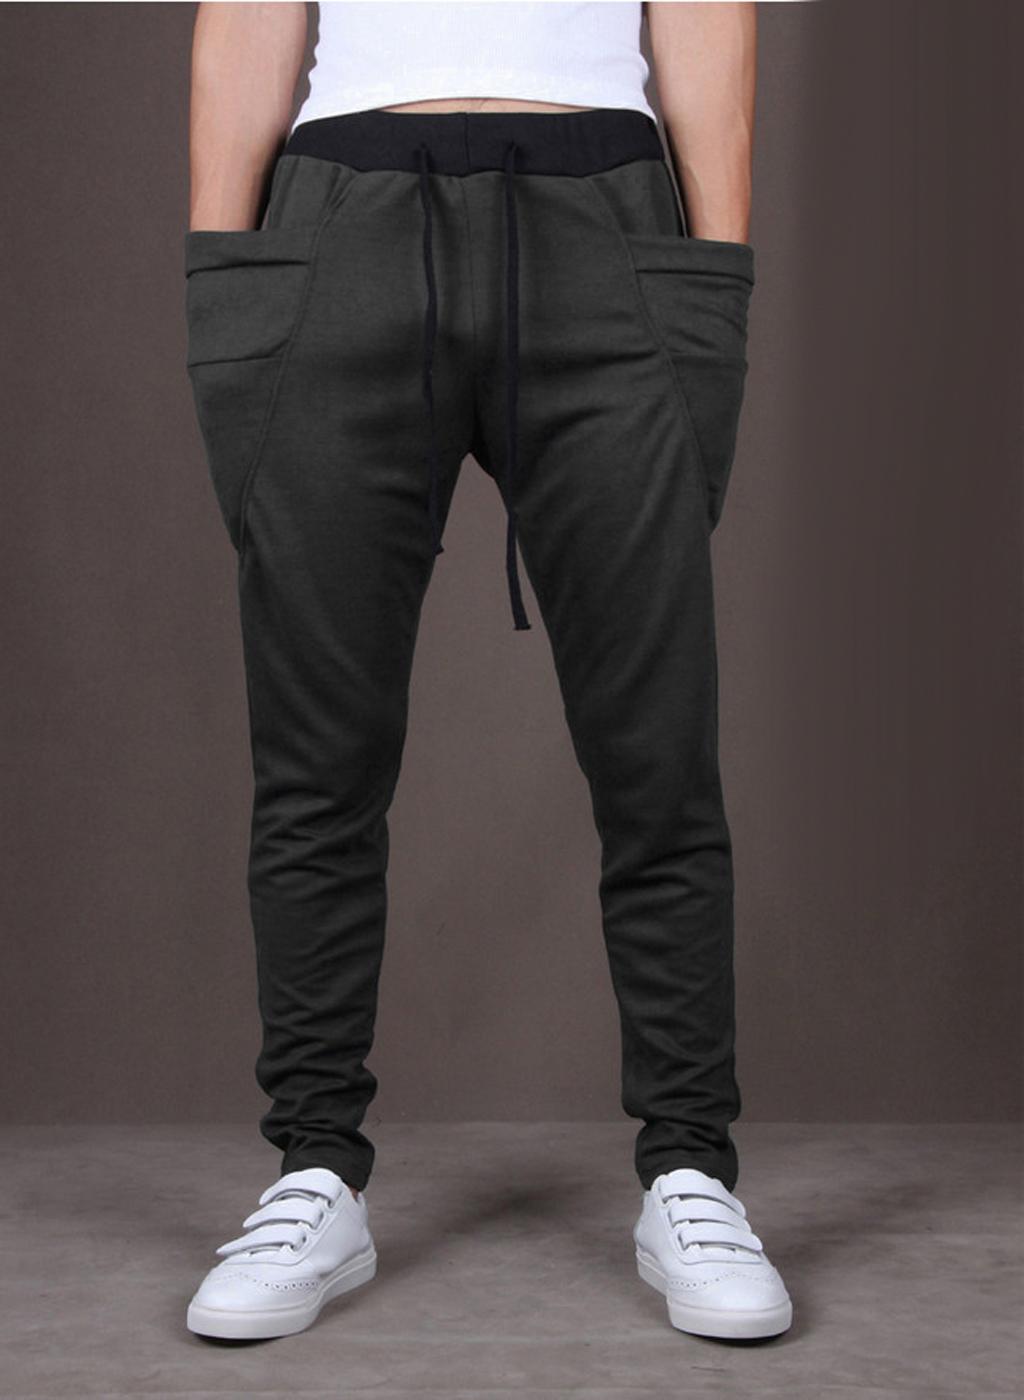 Mens Jogger Dance Sportwear Baggy Pants Trousers Sweatpants Dark Grey L